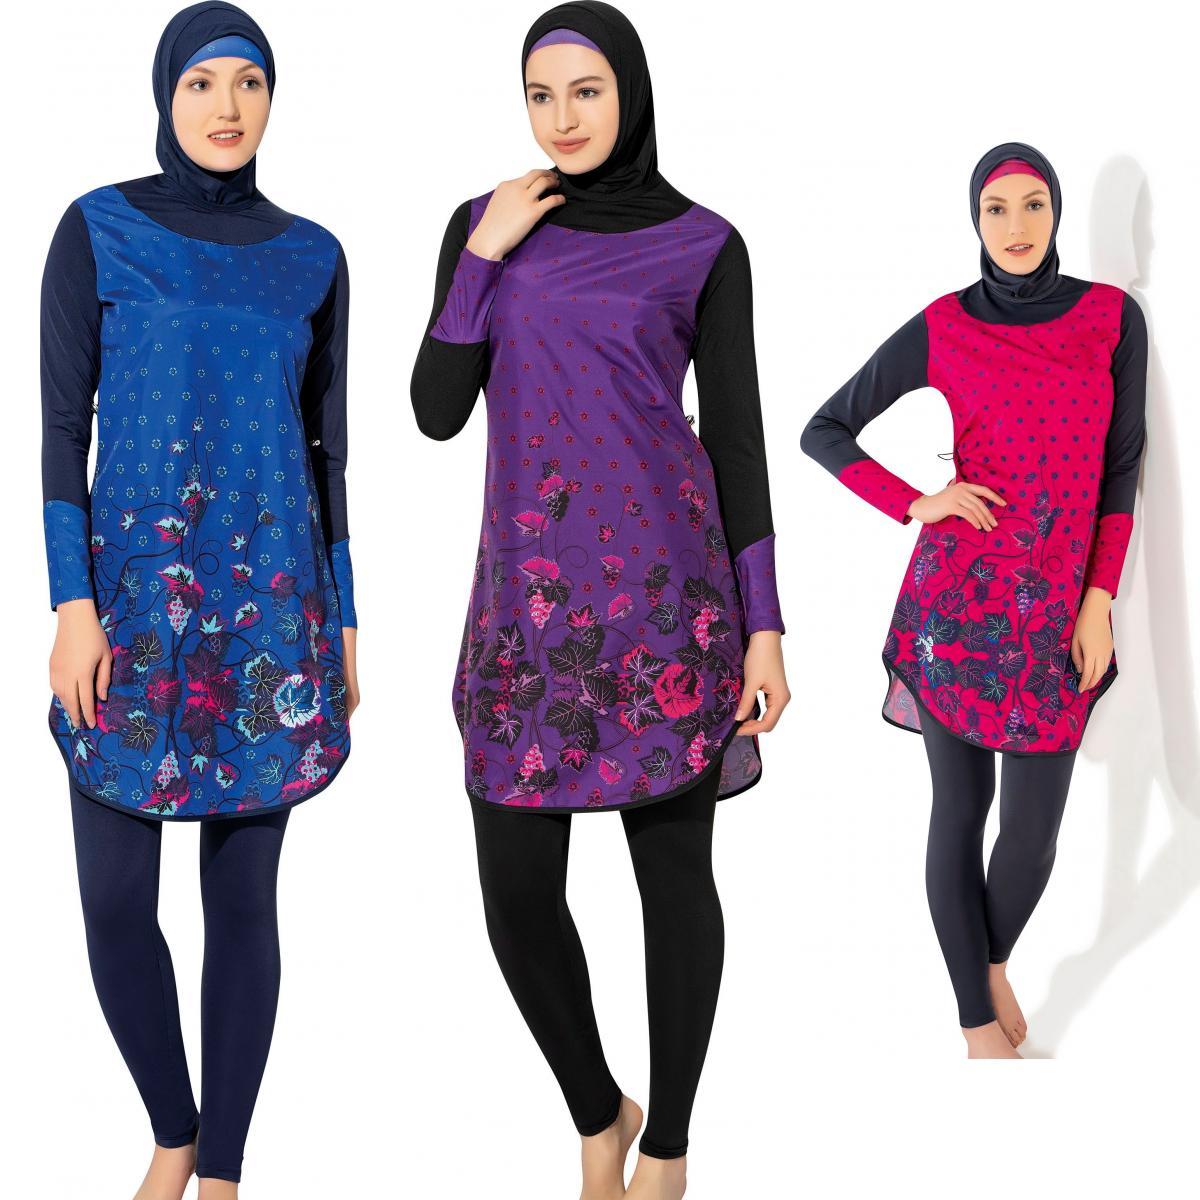 Argisa 7115 traje de baño musulmán de manga larga burkini S-XXL cremallera oculta Hijab islámico traje de baño Burkinis cubierta completa de surf de natación